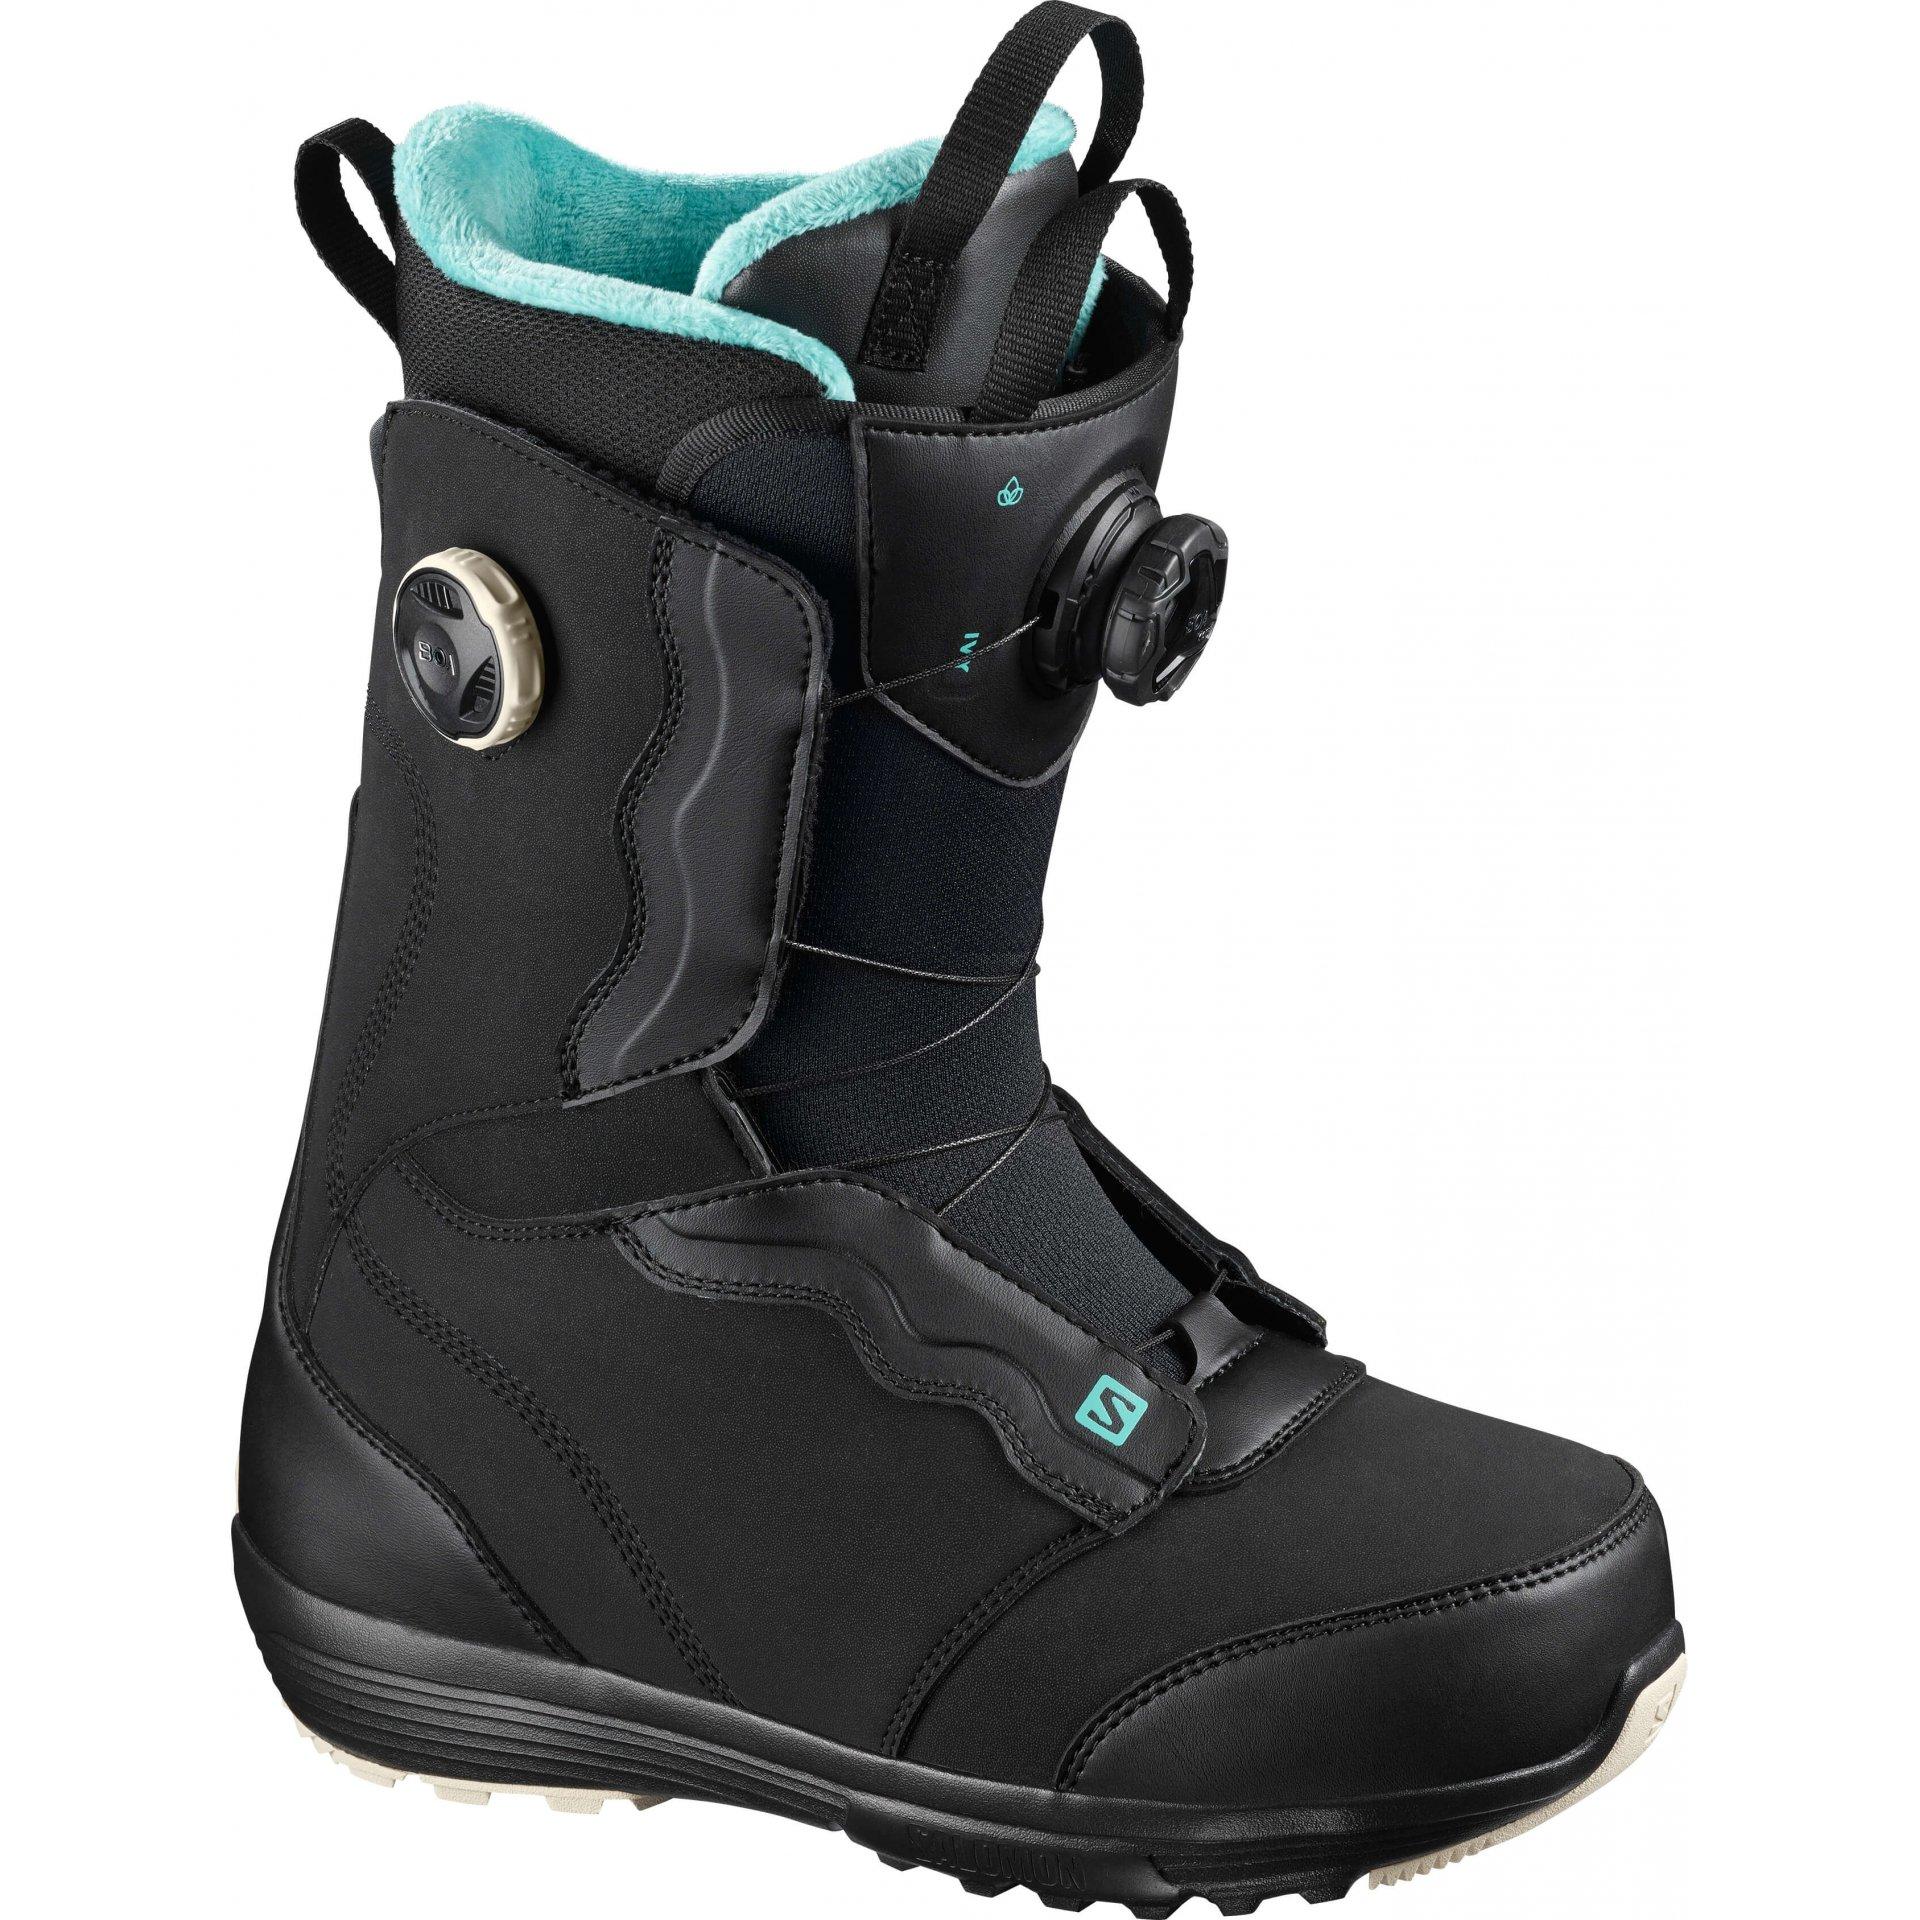 BUTY SNOWBOARDOWE SALOMON IVY BOA SJ L412136